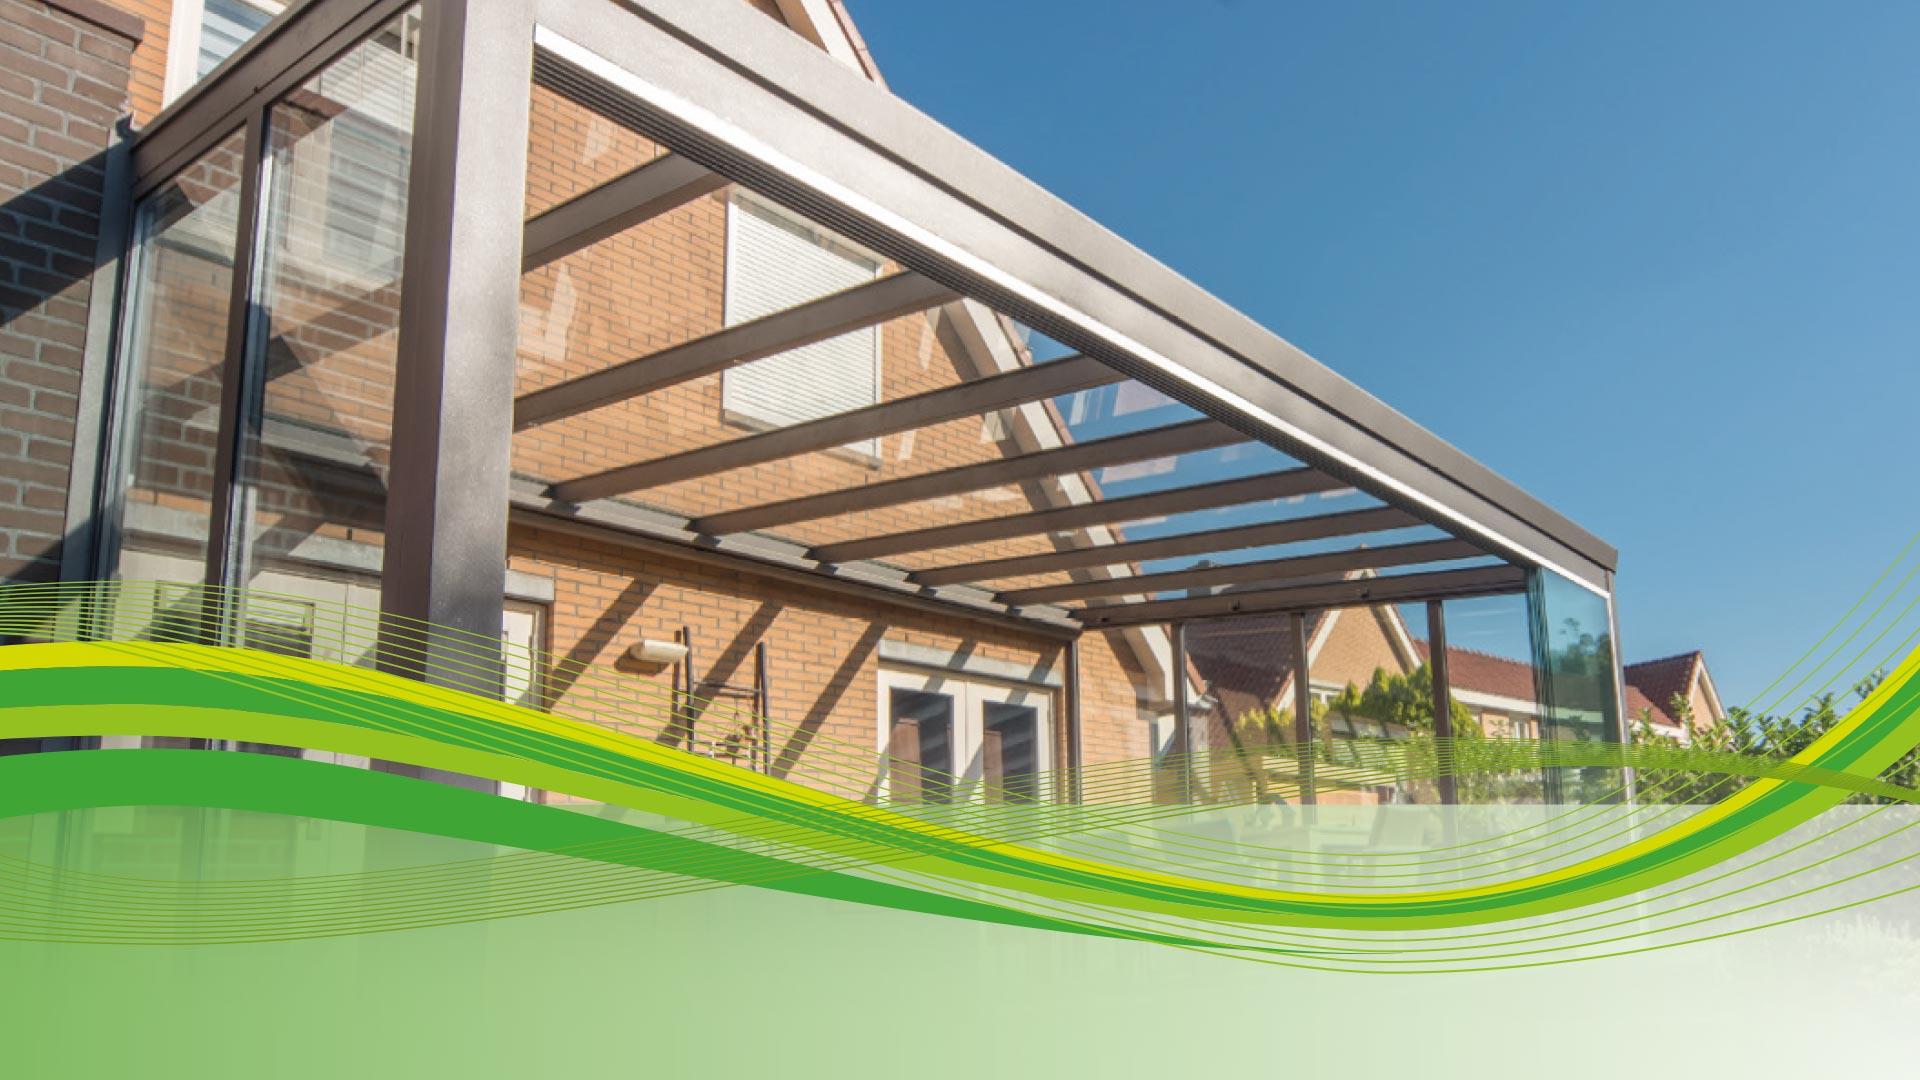 Hulpmonteur zonwering en veranda's